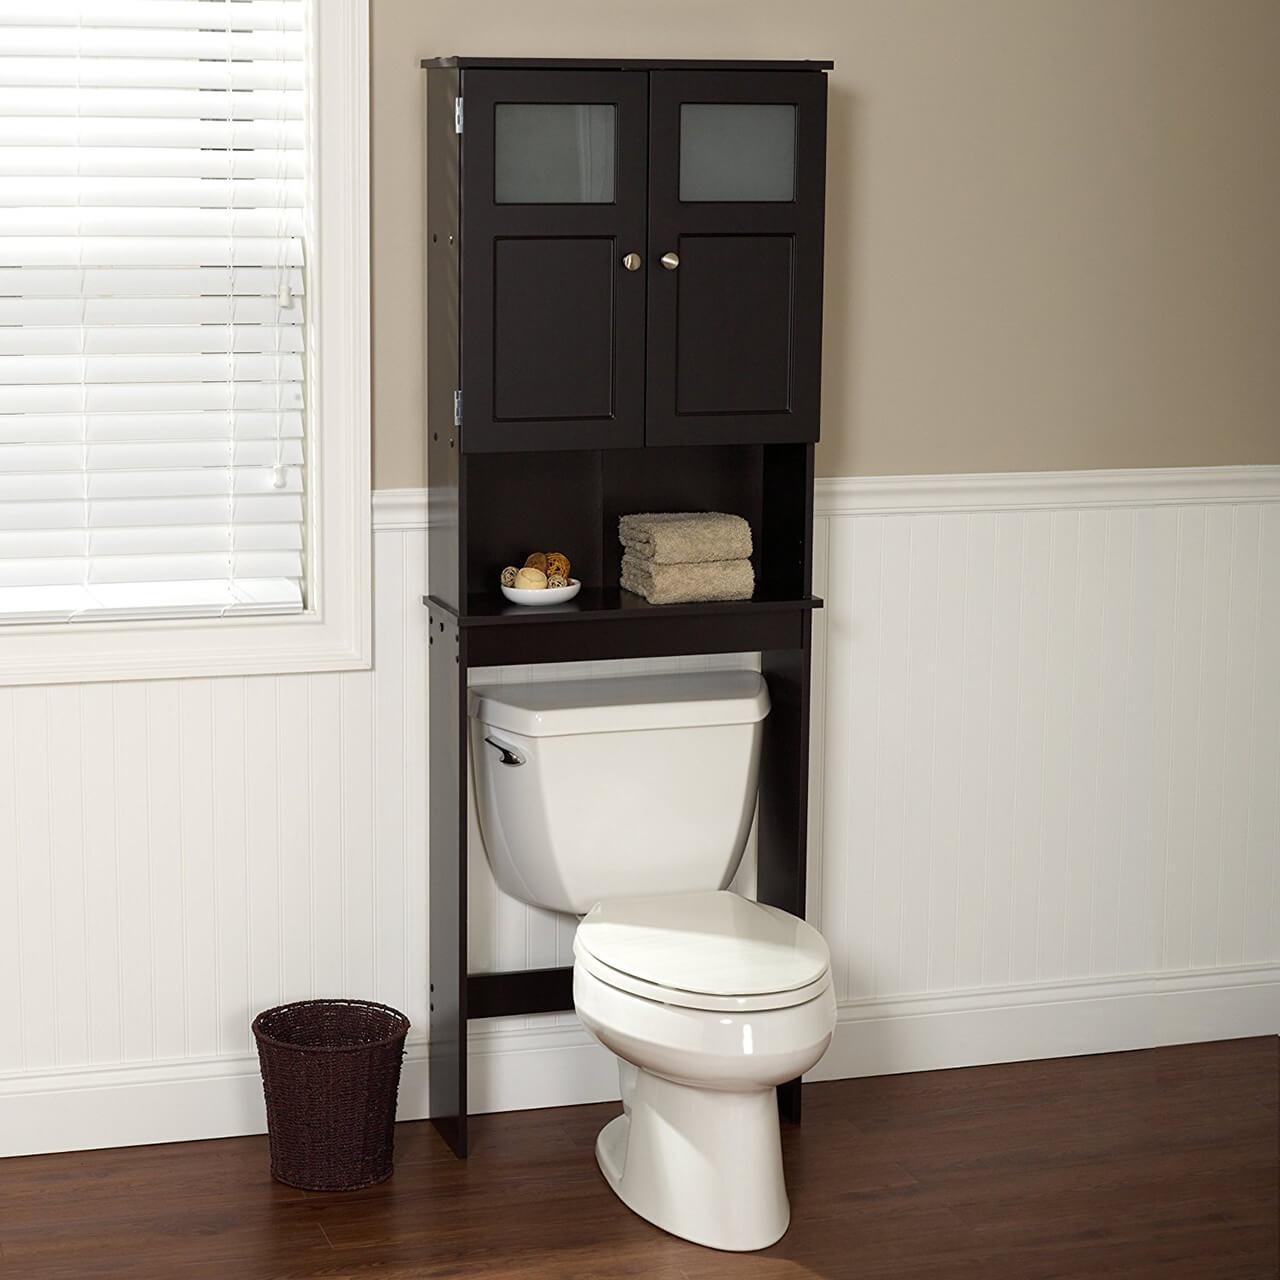 Particular Zenna Home Bathroom Spacesaver Bathroom Storage Cabinet Ideas 2018 Bathroom Cabinet Hardware Ideas Bathroom Cabinet Ideas 2018 houzz-02 Bathroom Cabinet Ideas